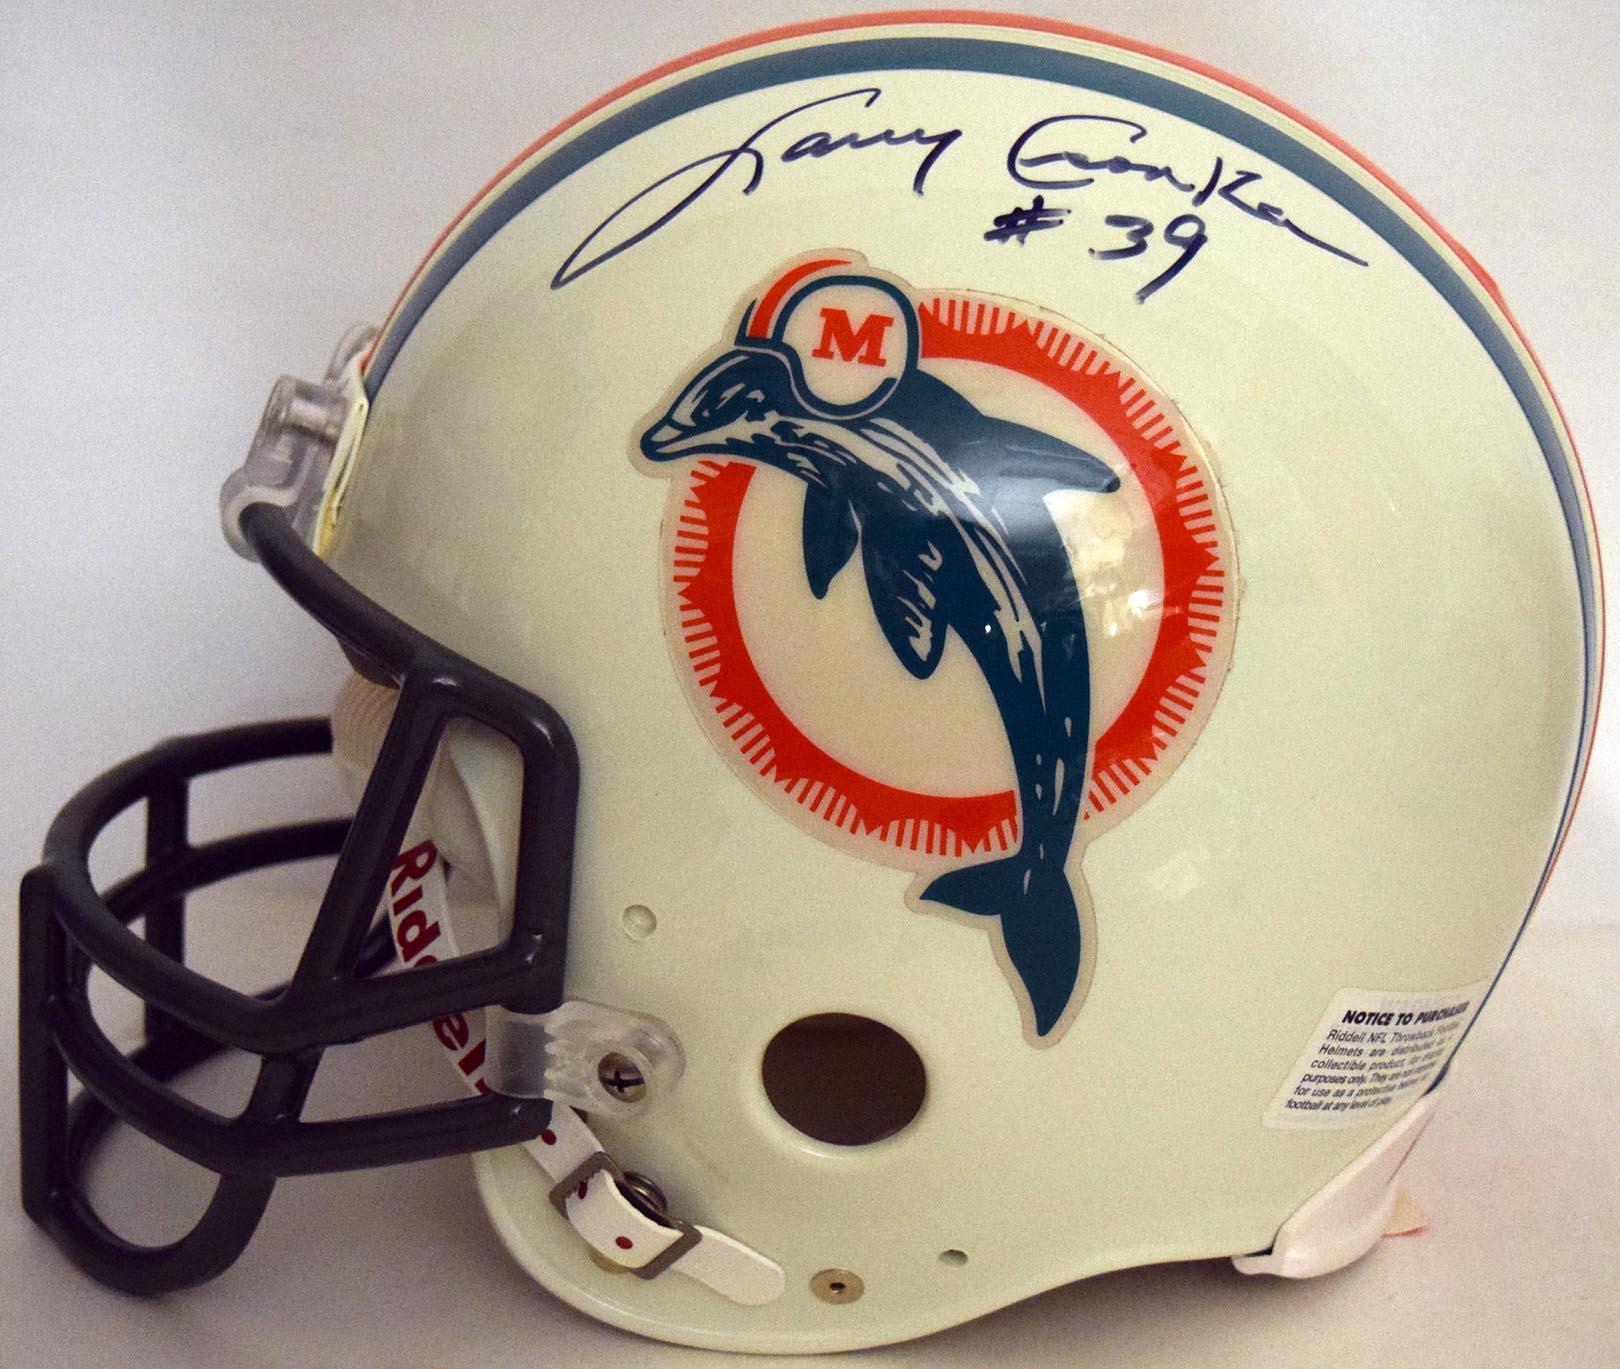 Lot #860  Full Size Helmet  Csonka, Larry Cond: 9.5